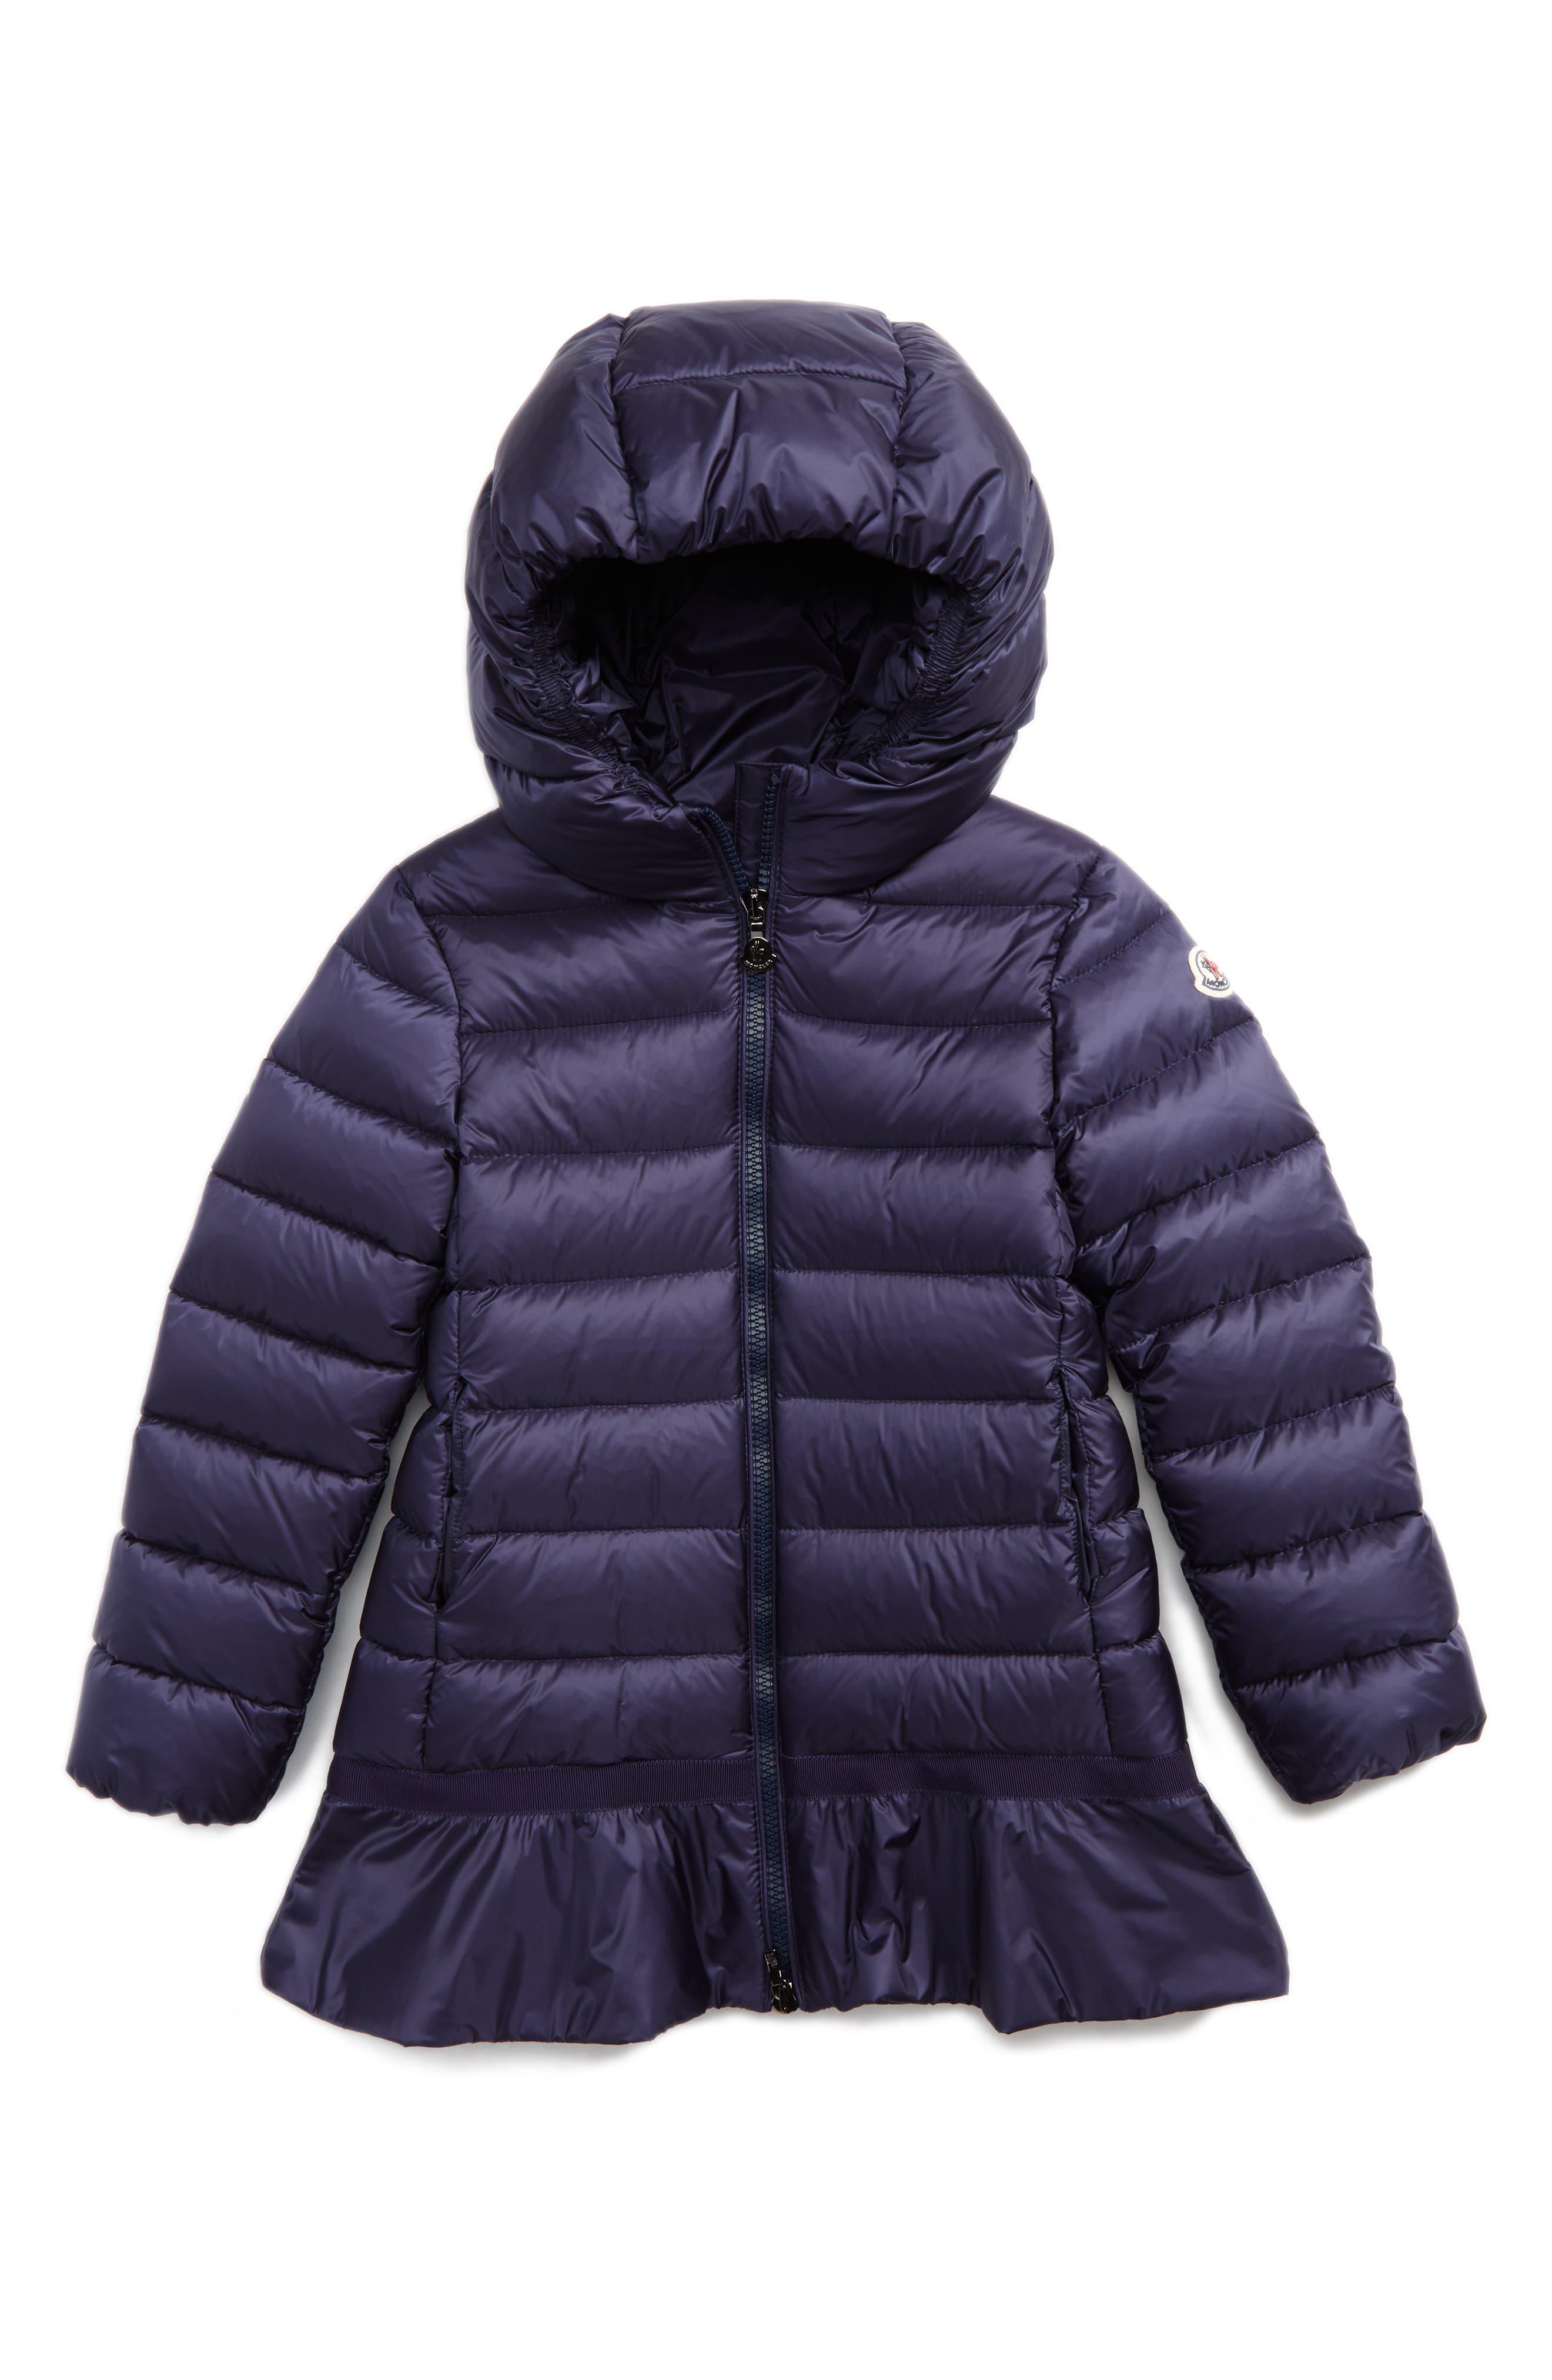 Alternate Image 1 Selected - Moncler Nadra Hooded Down Jacket (Little Girls & Big Girls)